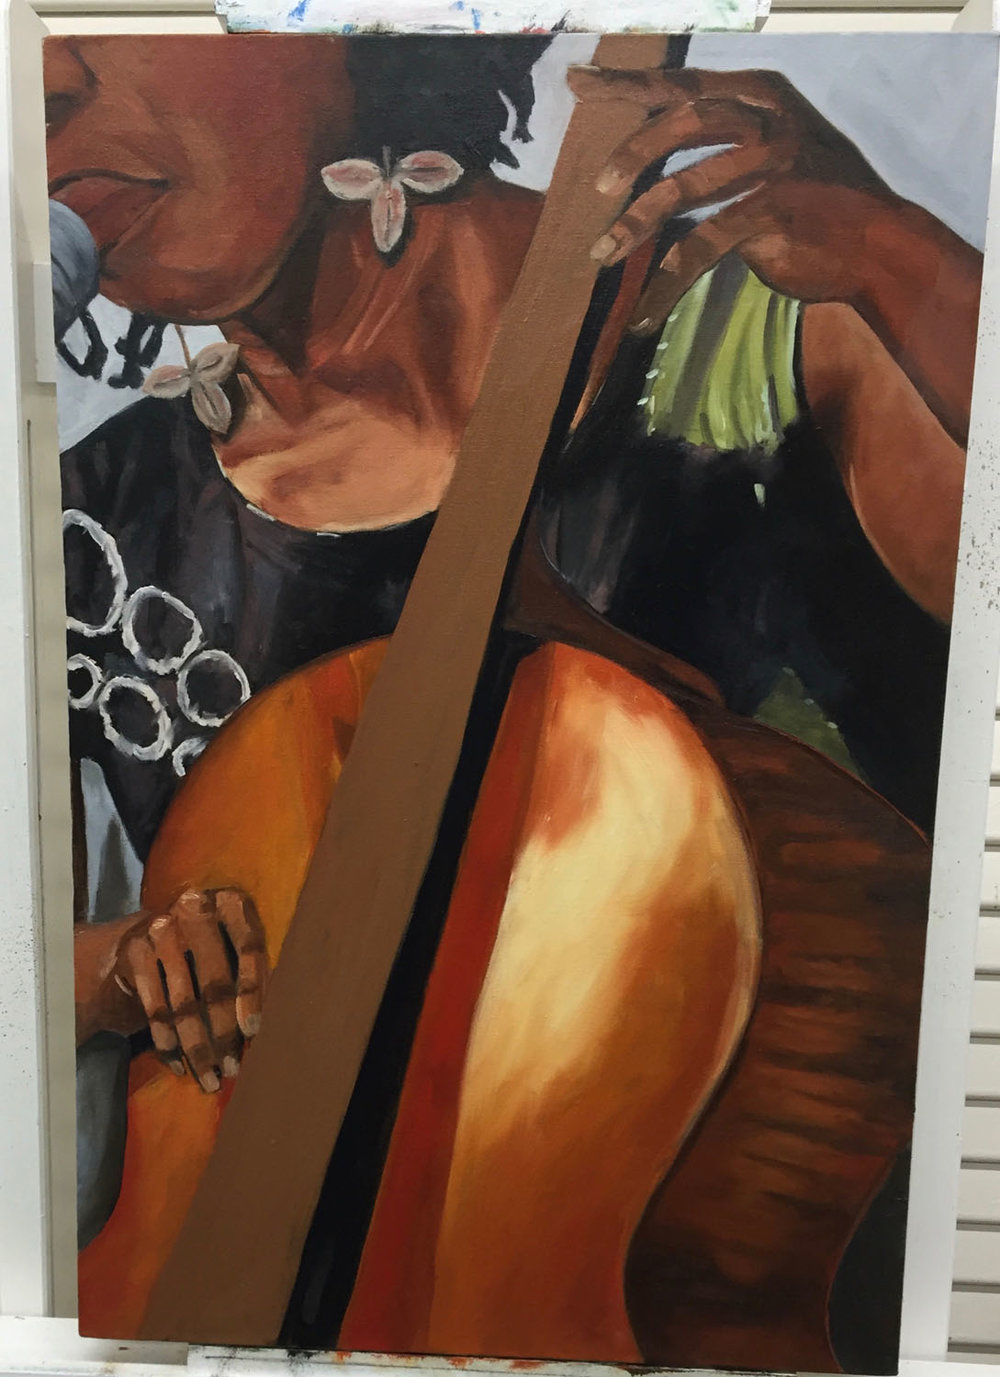 in-process-painting-portrait-of-cellist-musician-singer-shana-tucker-in-concert-by-phyllis-sharpe-artist-IMG_1657.jpg